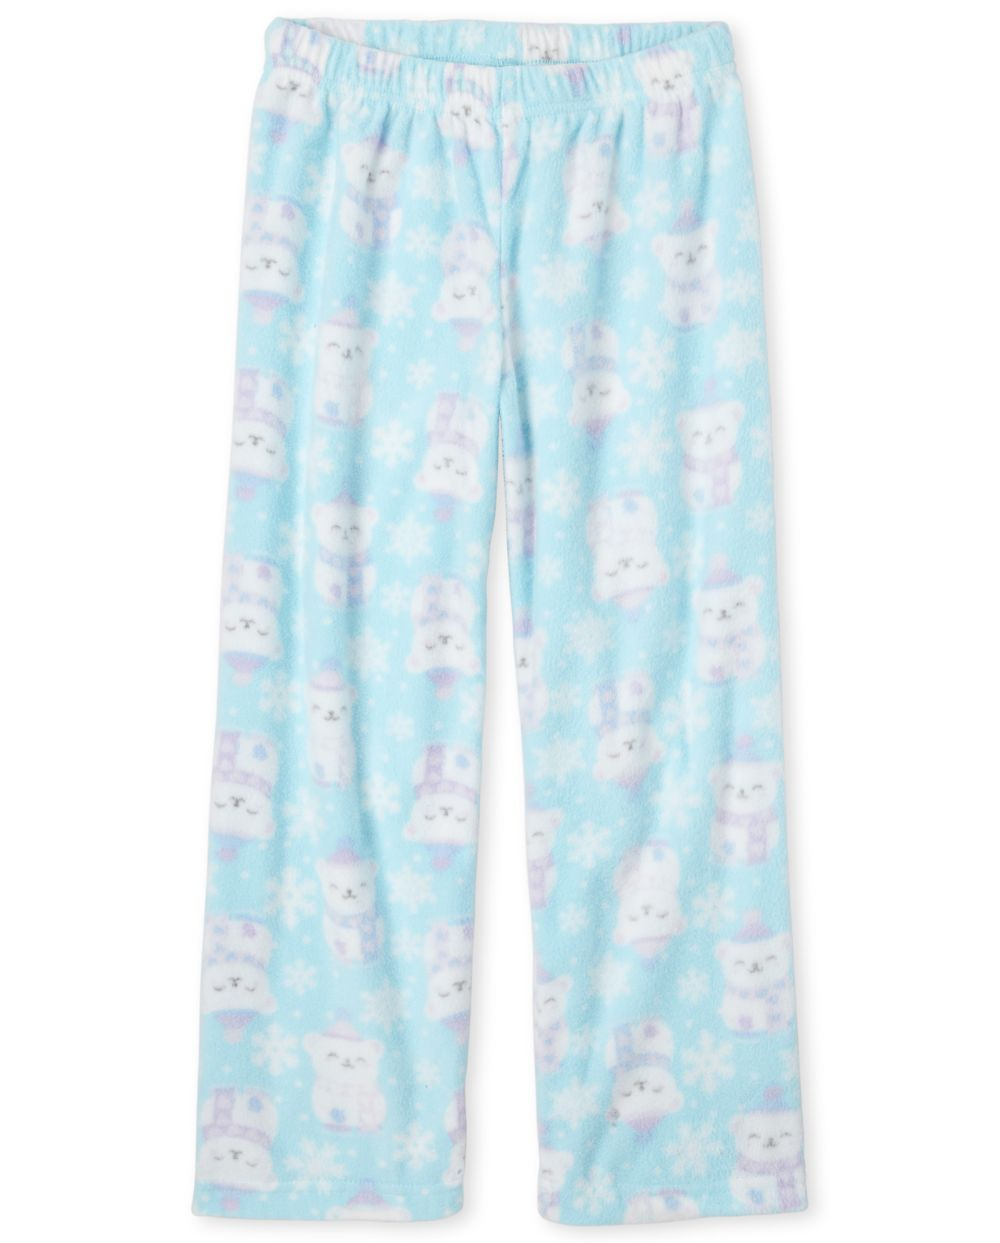 Girls Polar Bear Fleece Pajama Pants